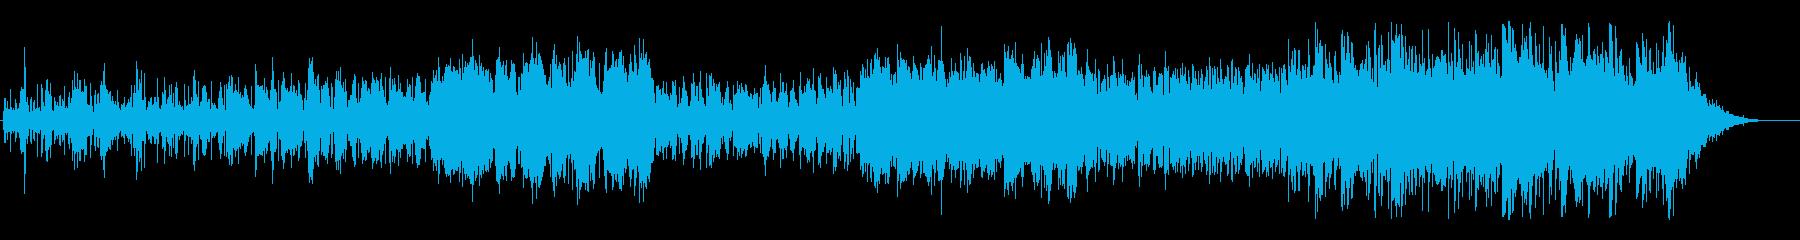 R&B /ヒップホップ、男性ボーカ...の再生済みの波形